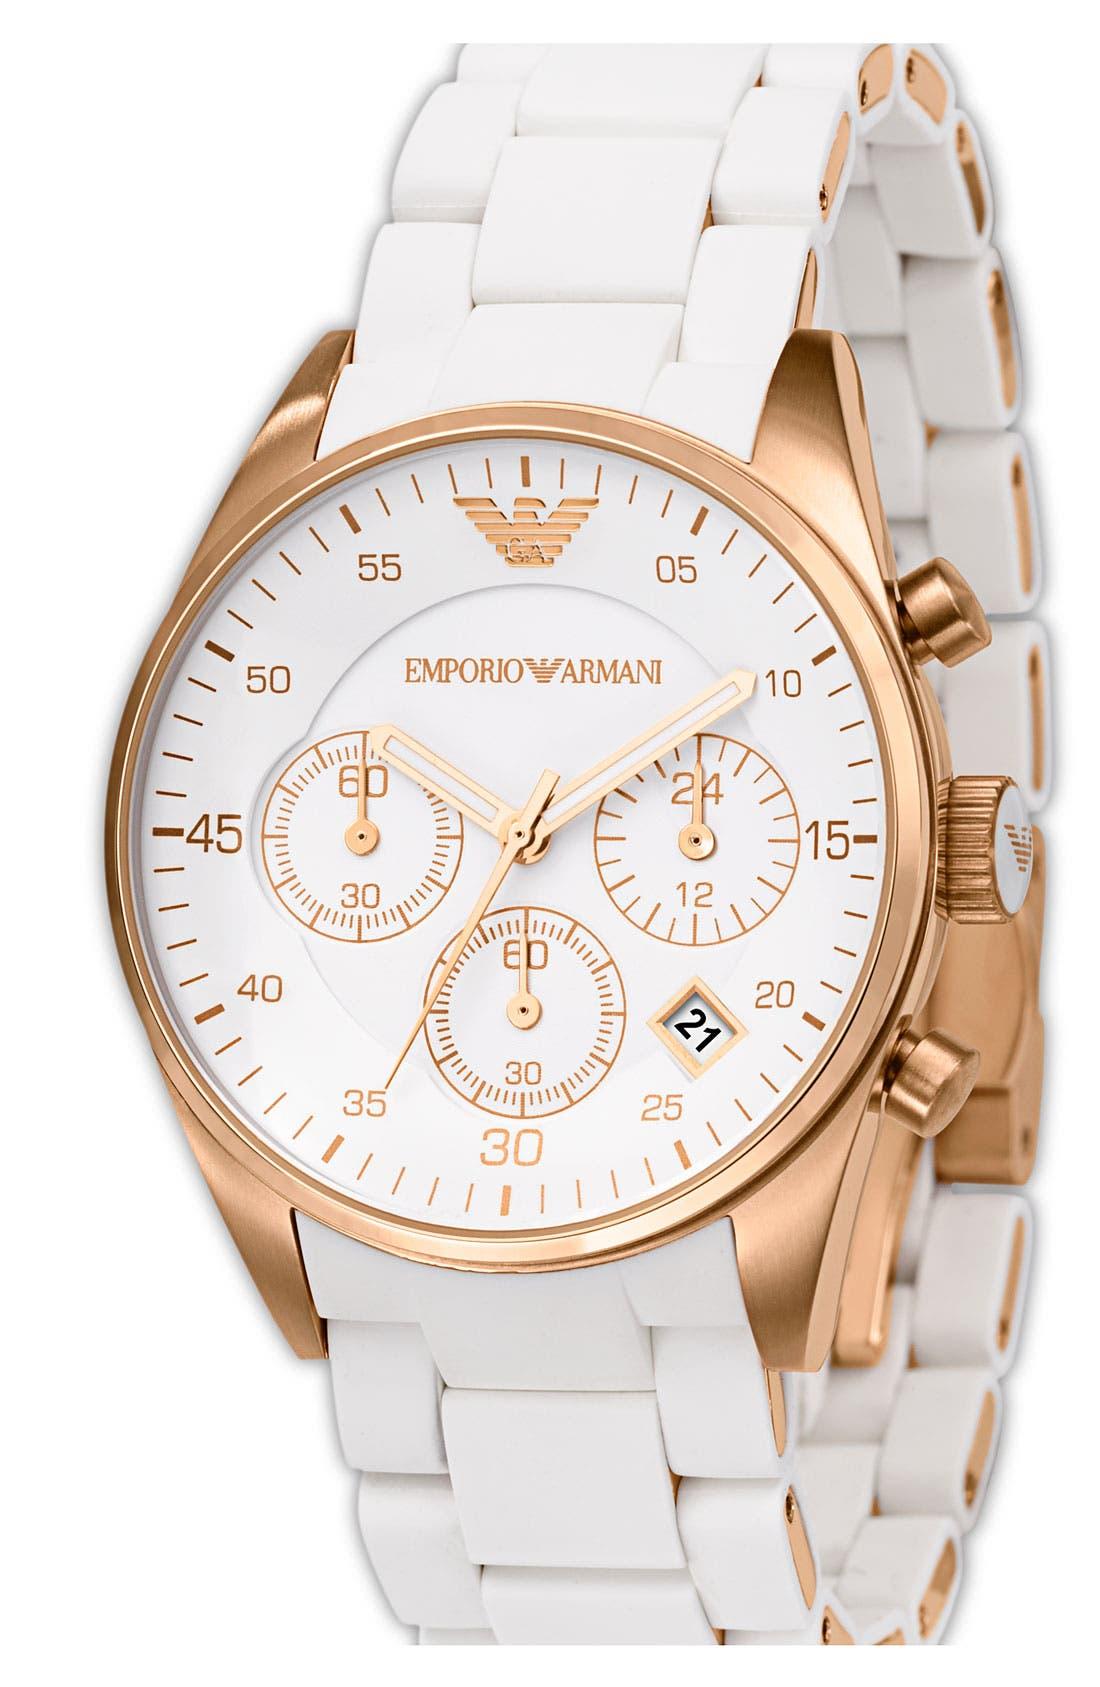 Main Image - Emporio Armani Ladies' Round Stainless Steel Chronograph Watch, 38mm